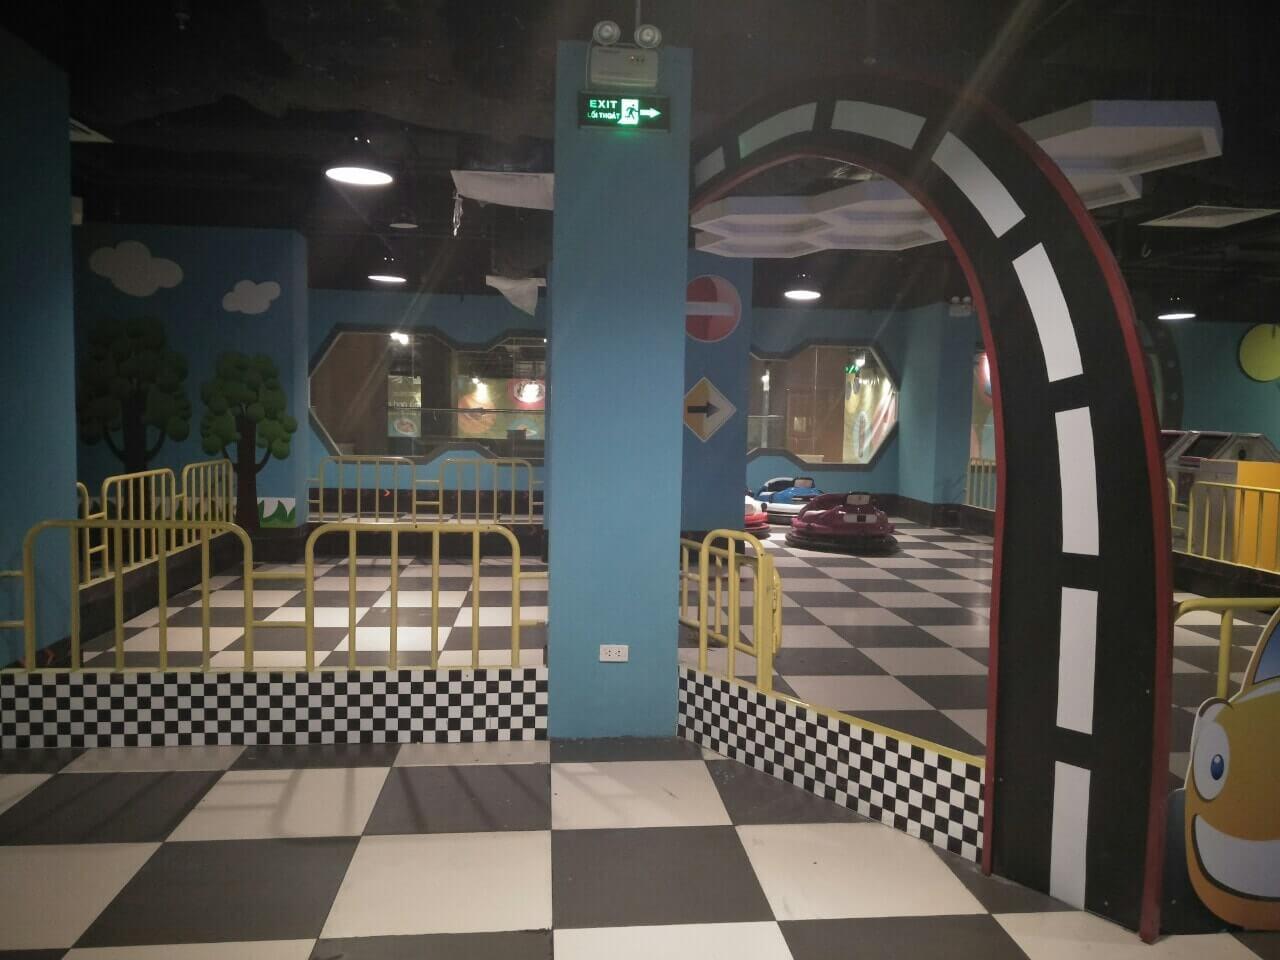 GOADESIGN Thiết Kế Khu Vui Chơi Garden Mall - Q5 (14)